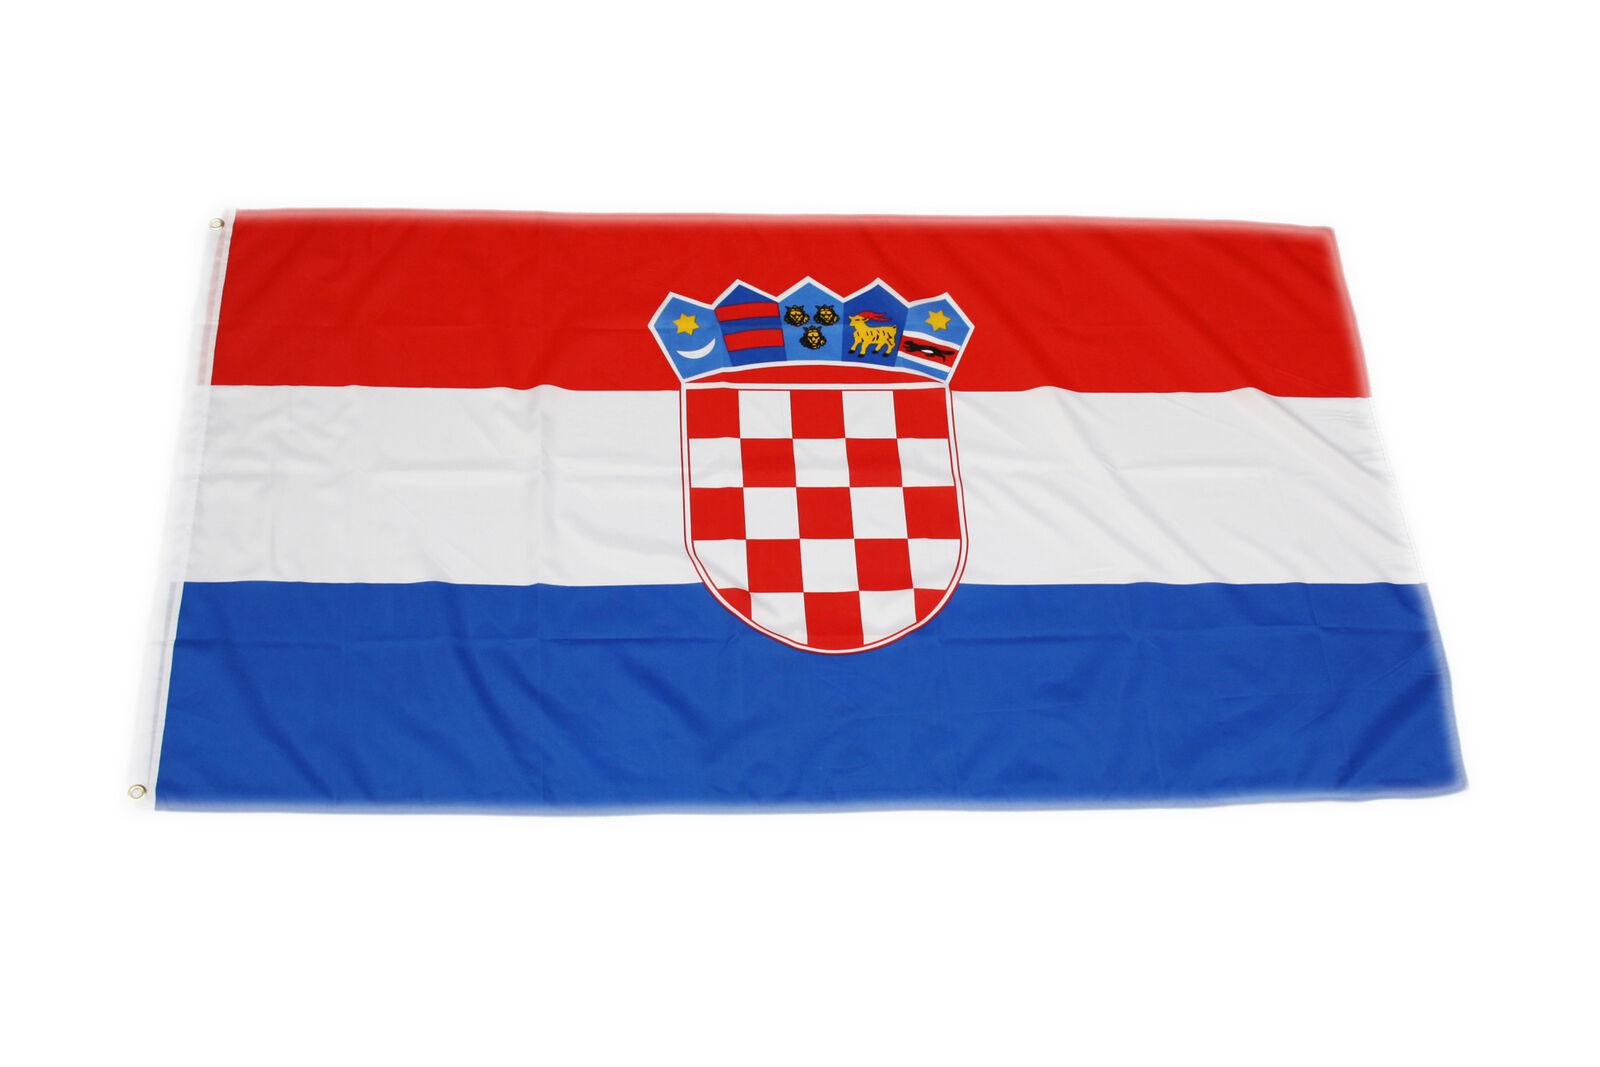 unsere NACHBARN noch mehr 90x150cm Hissfahne Fahne Flagge Gott sieht alles